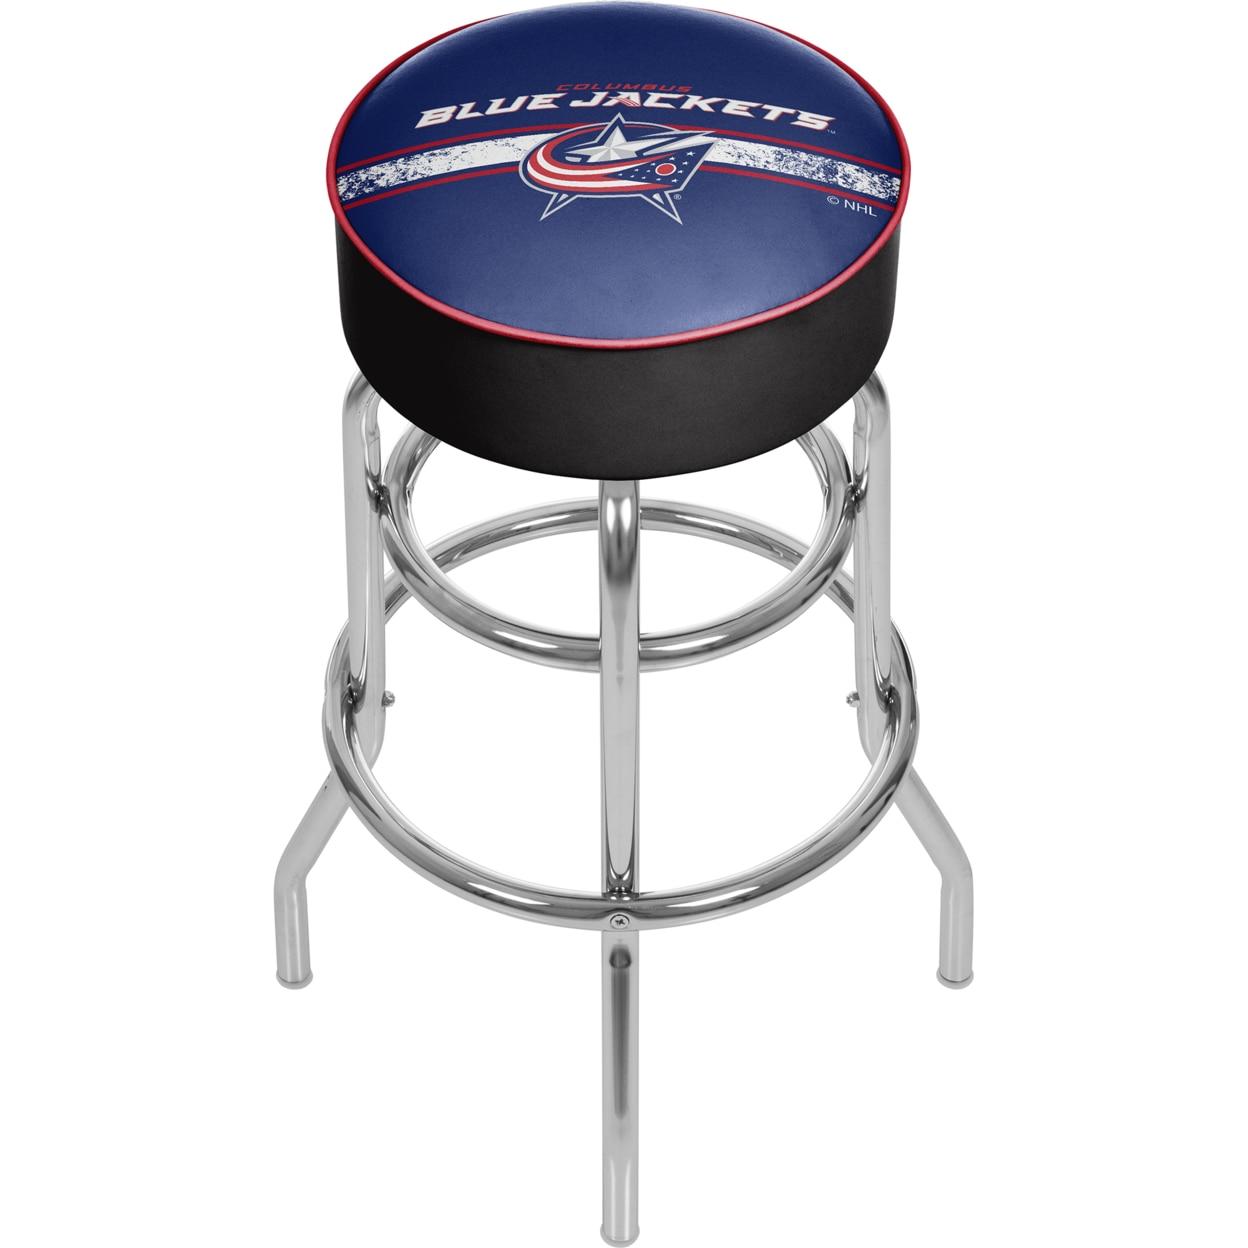 NHL Chrome Padded Swivel Bar Stool 30 Inches High - Columbus Blue Jackets nhl chrome 42 inch pub table columbus blue jackets